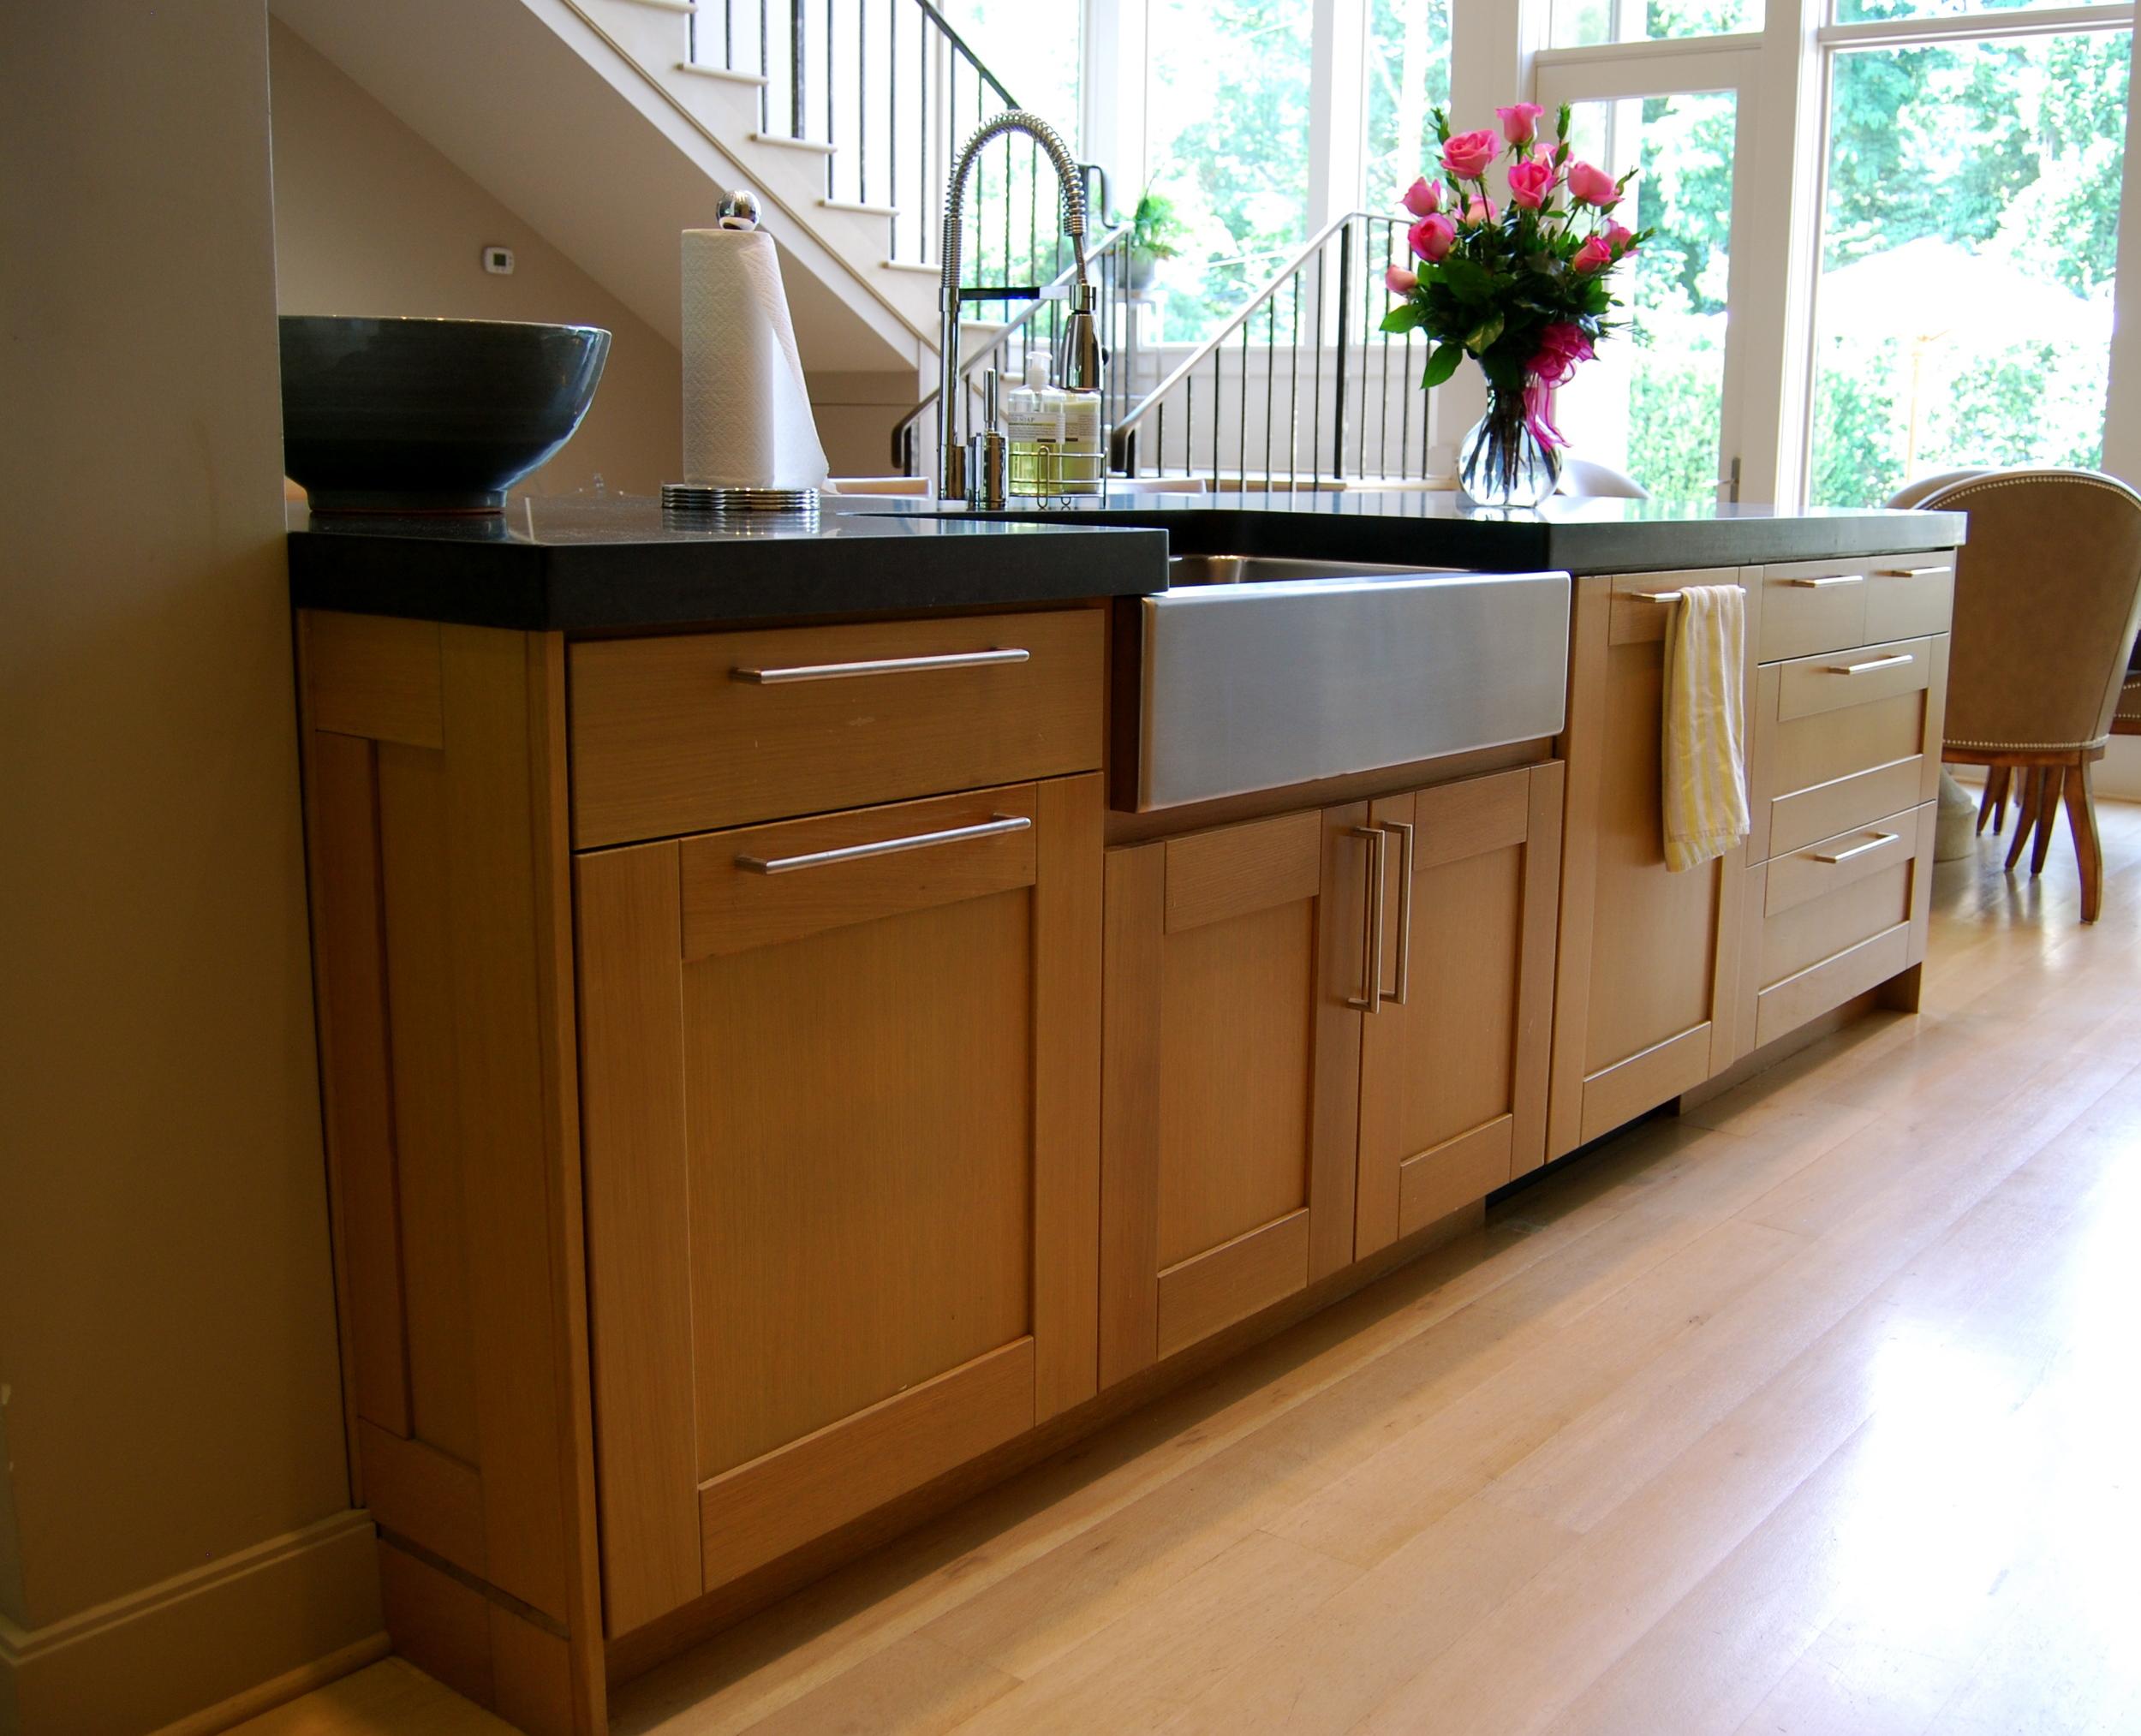 Cabinetry1.jpg